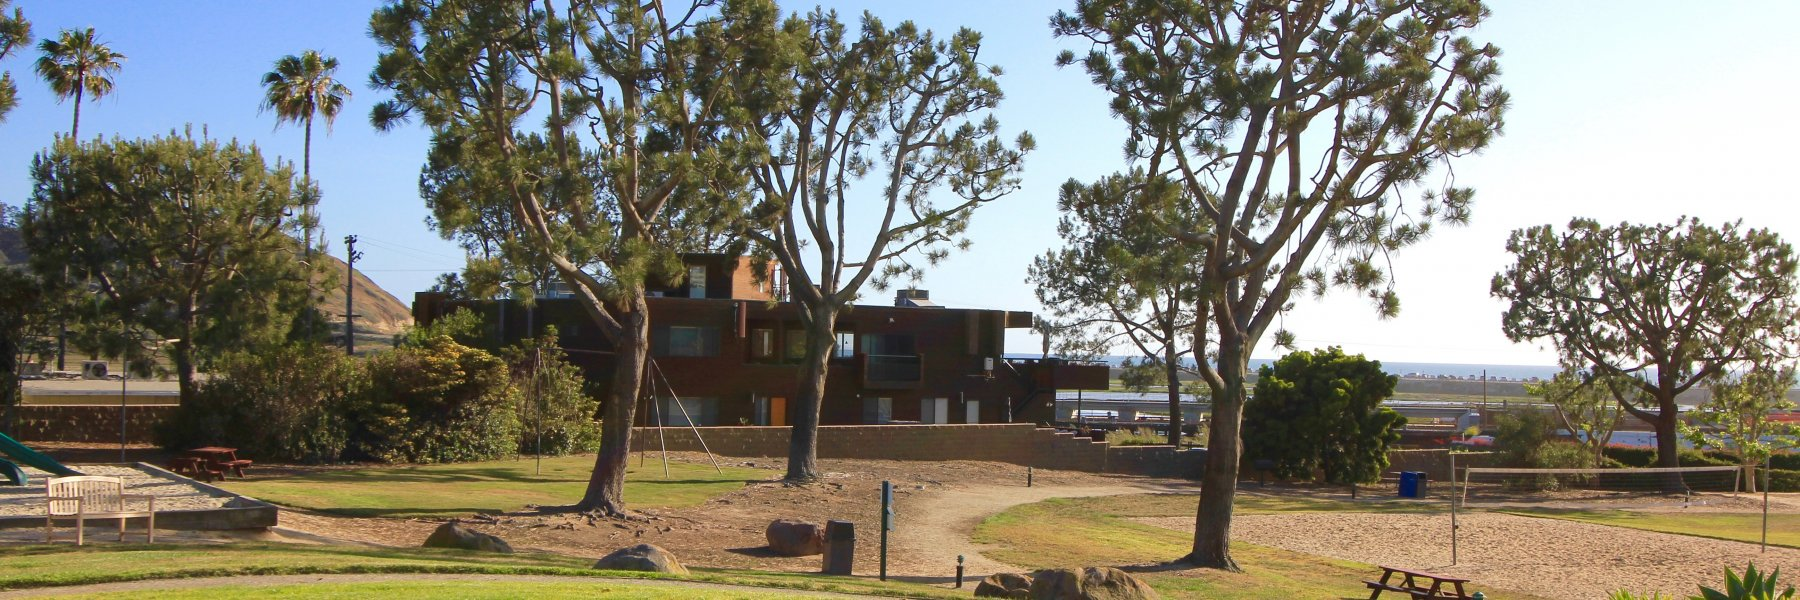 Sea Village is a community of homes in Del Mar California